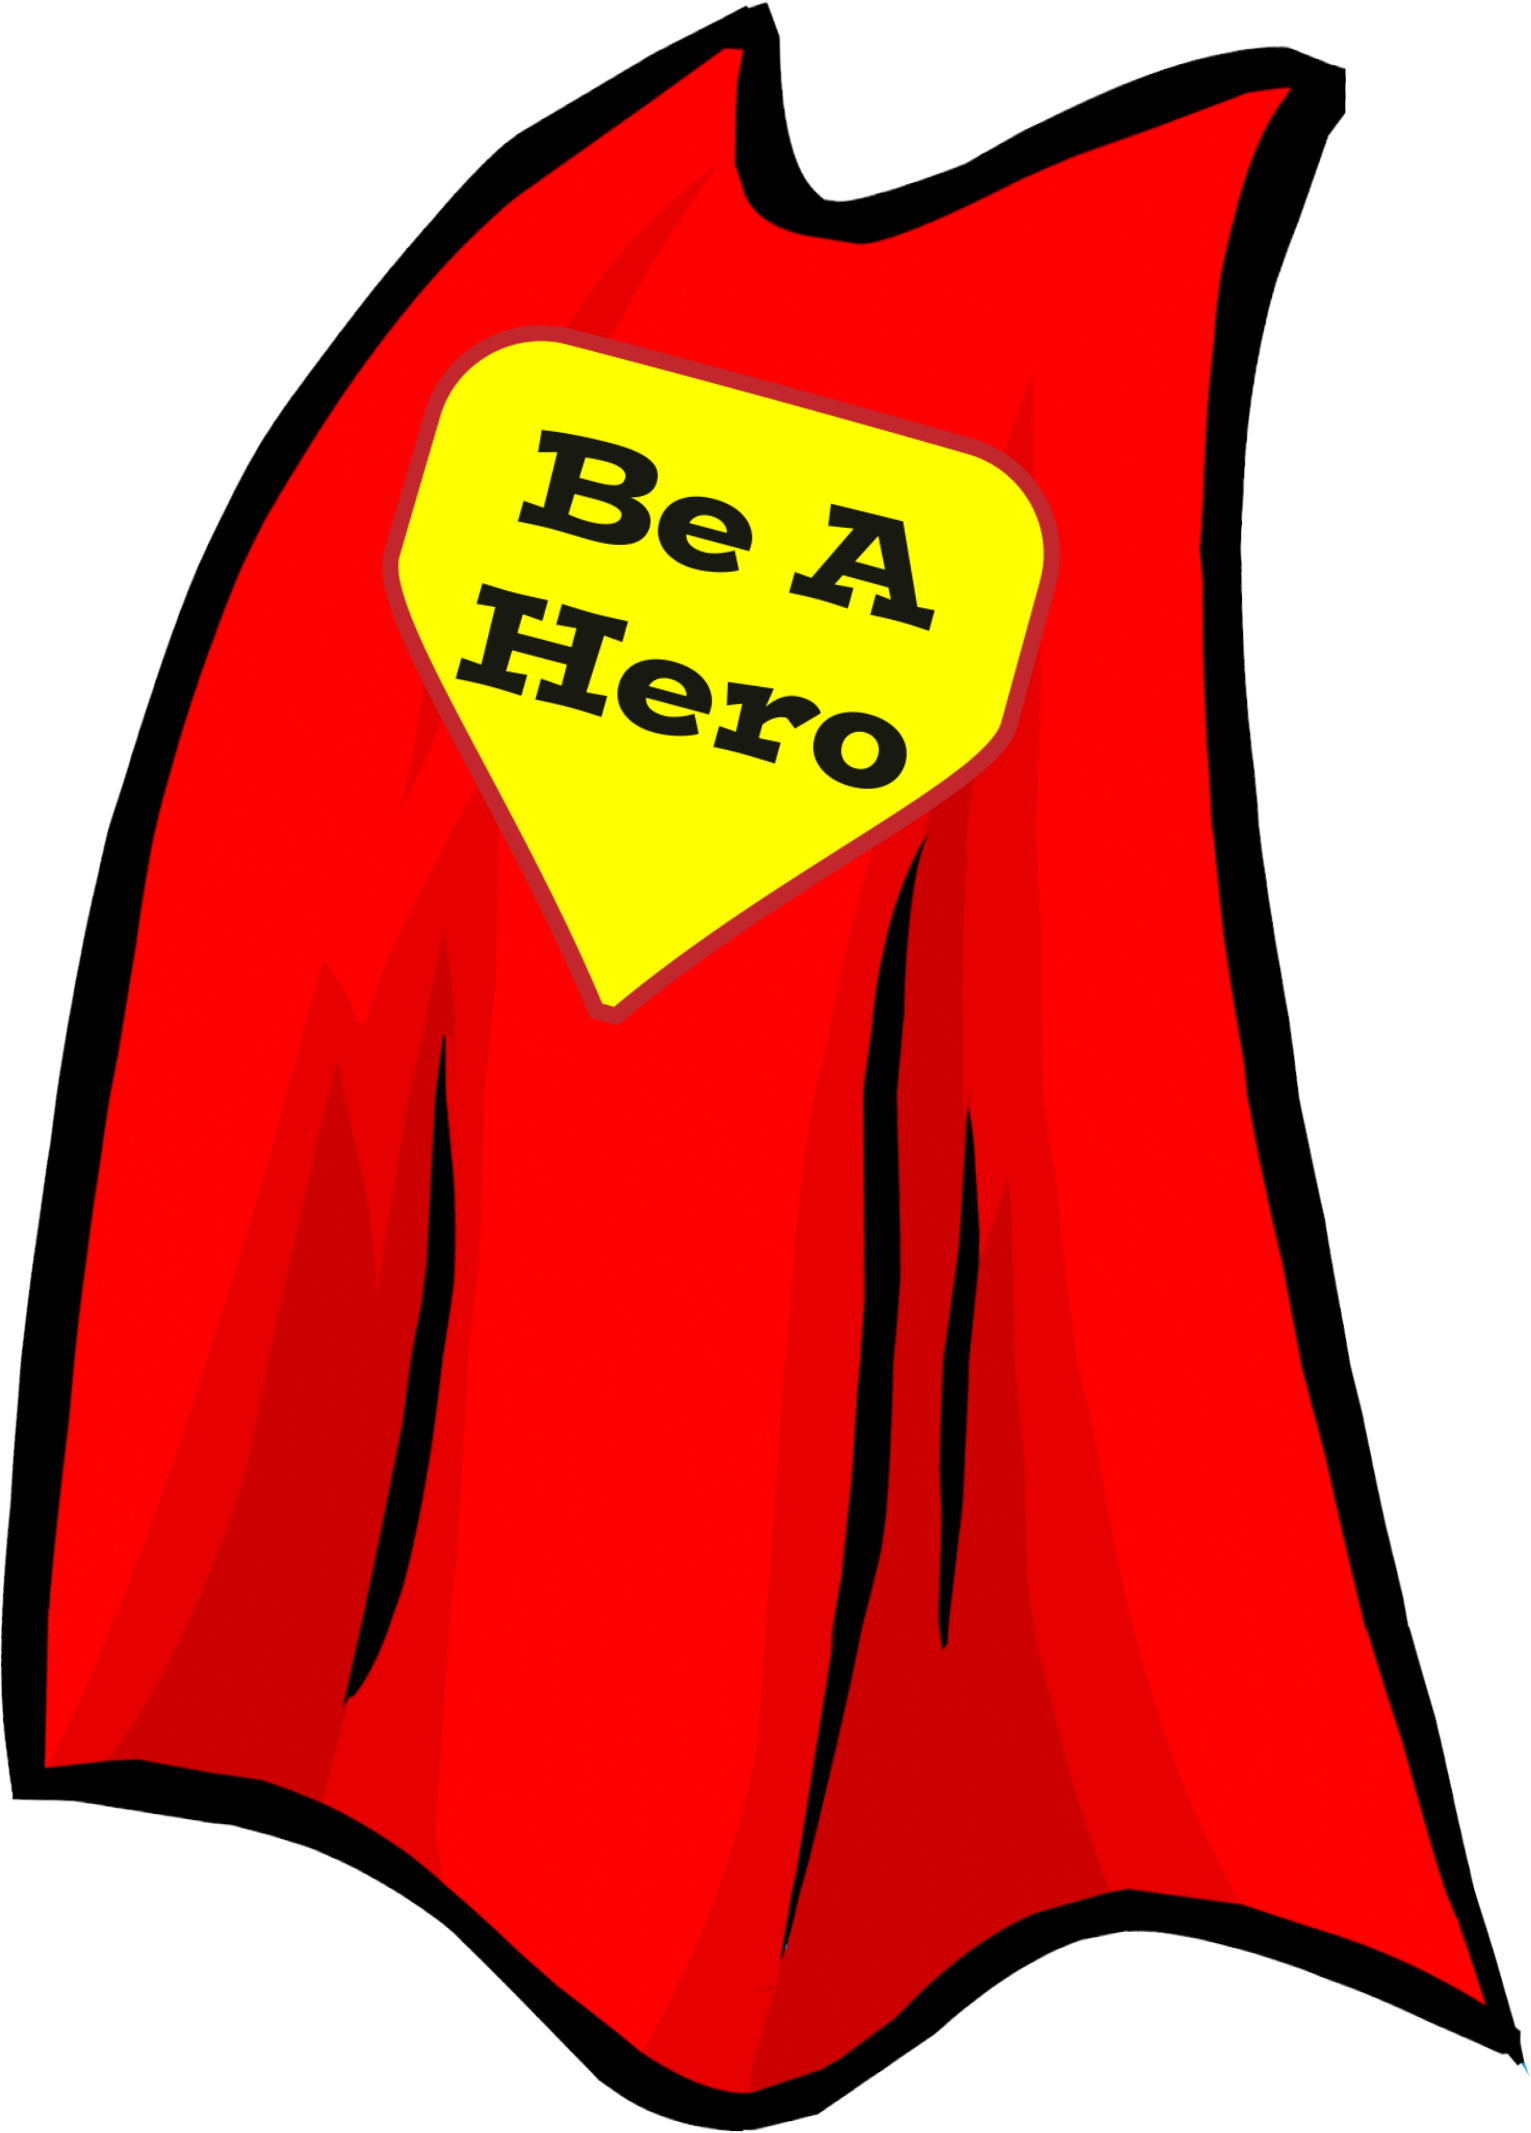 Super hero cape clipart svg freeuse stock Superhero Cape Drawing | Free download best Superhero Cape ... svg freeuse stock